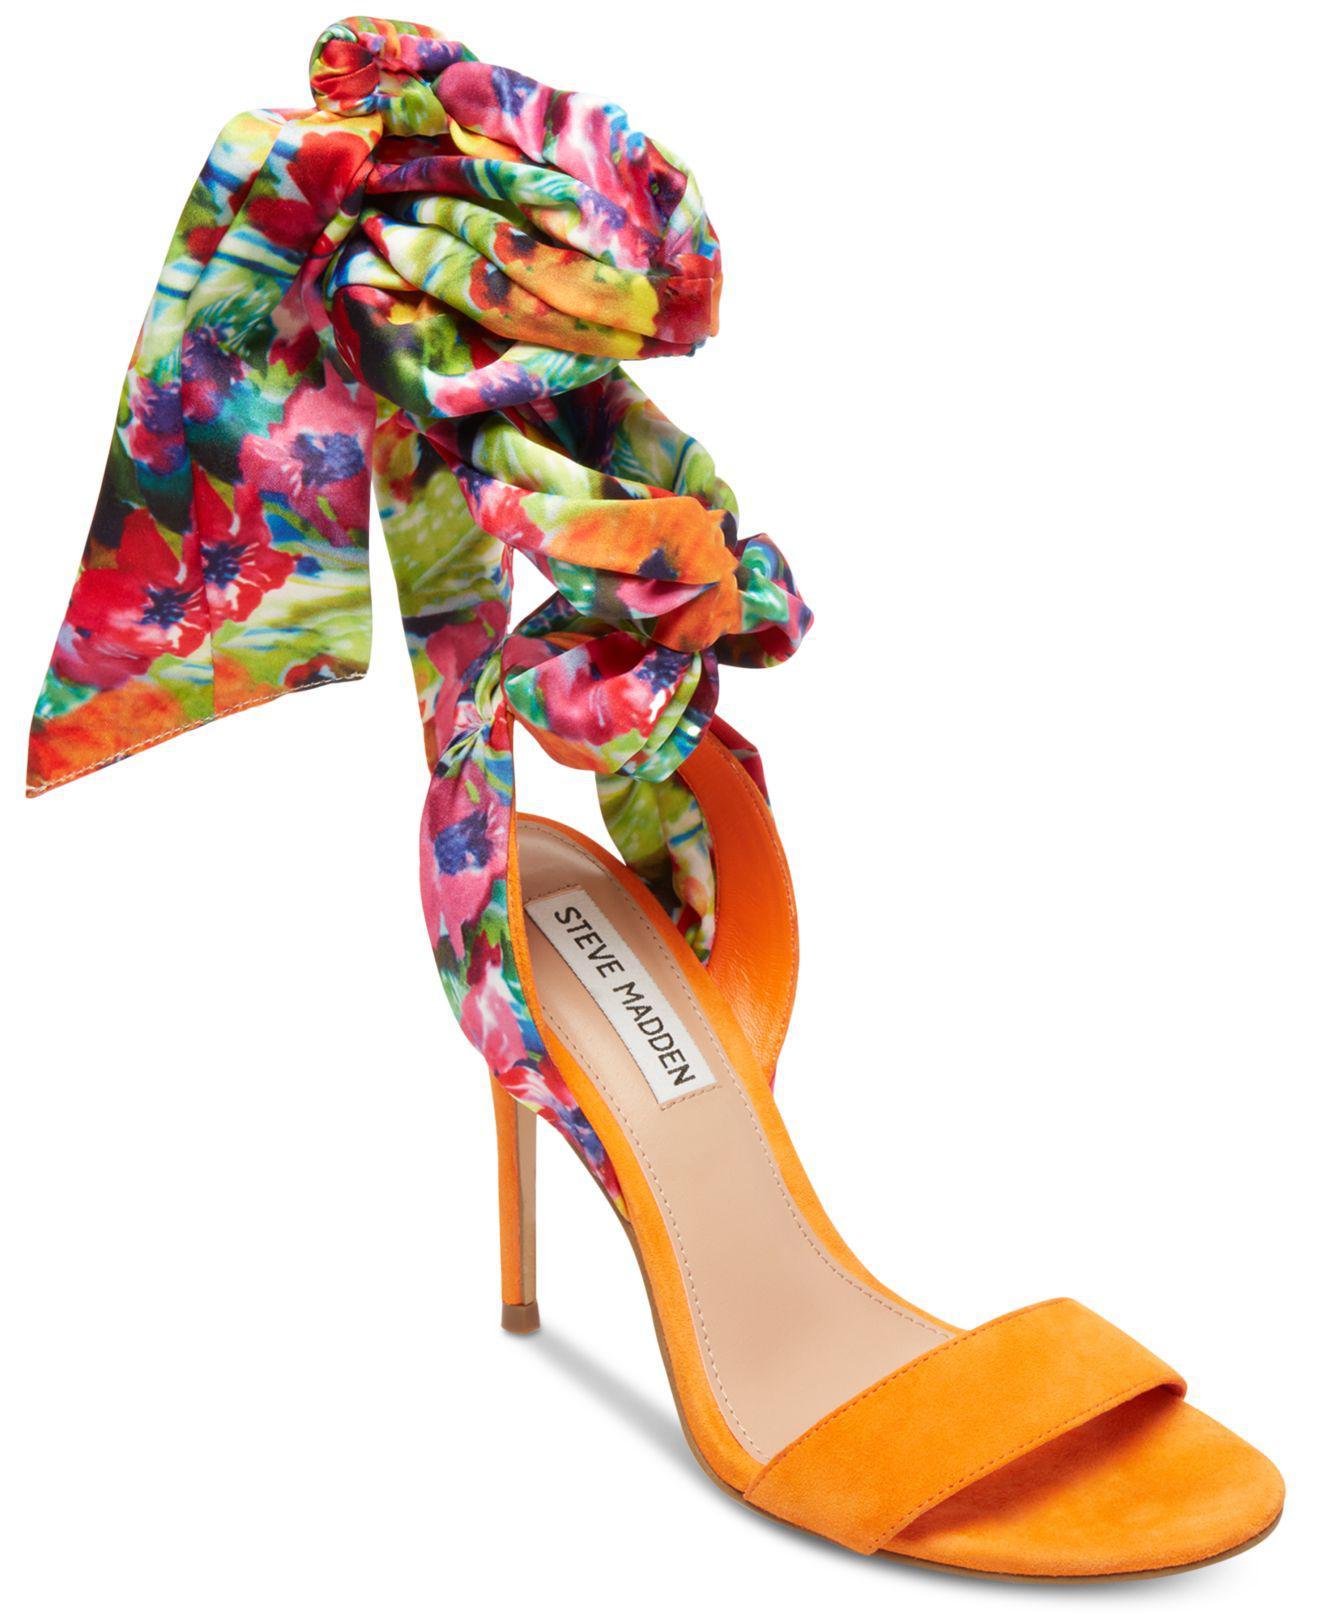 e57e36ccc984 Lyst - Steve Madden Oasis Tie-up Dress Sandals in Orange